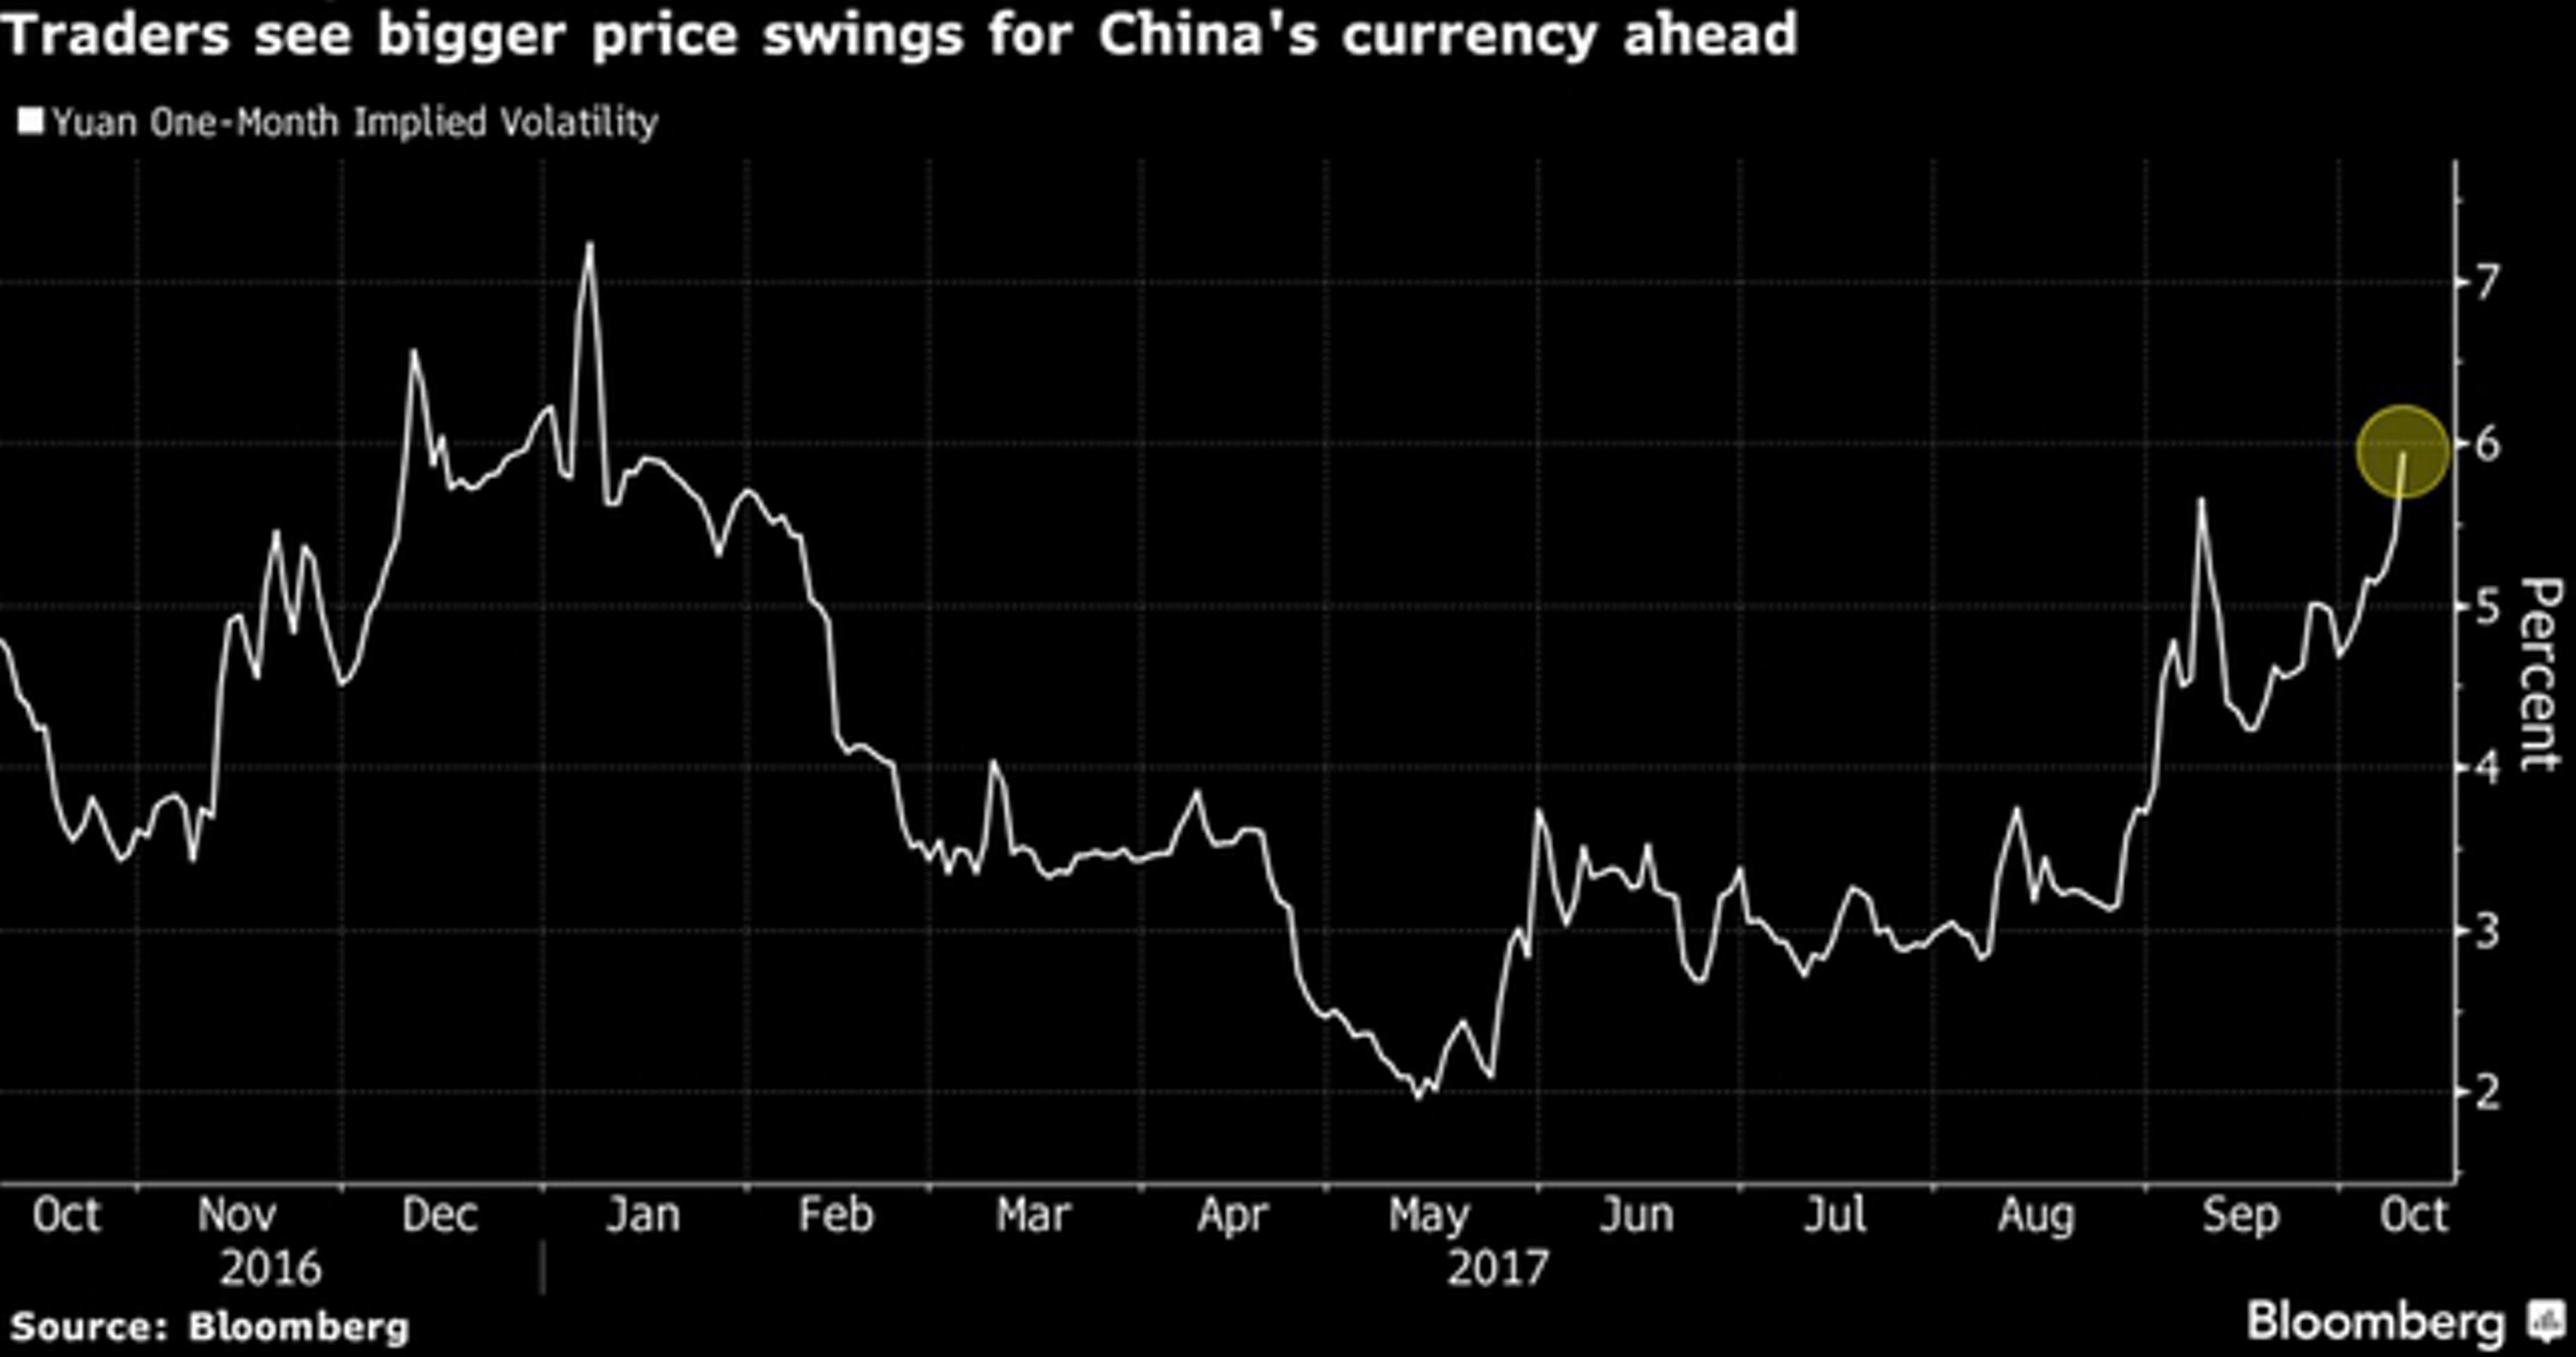 ЦБ Китая обеспокоился волатильностью юаня